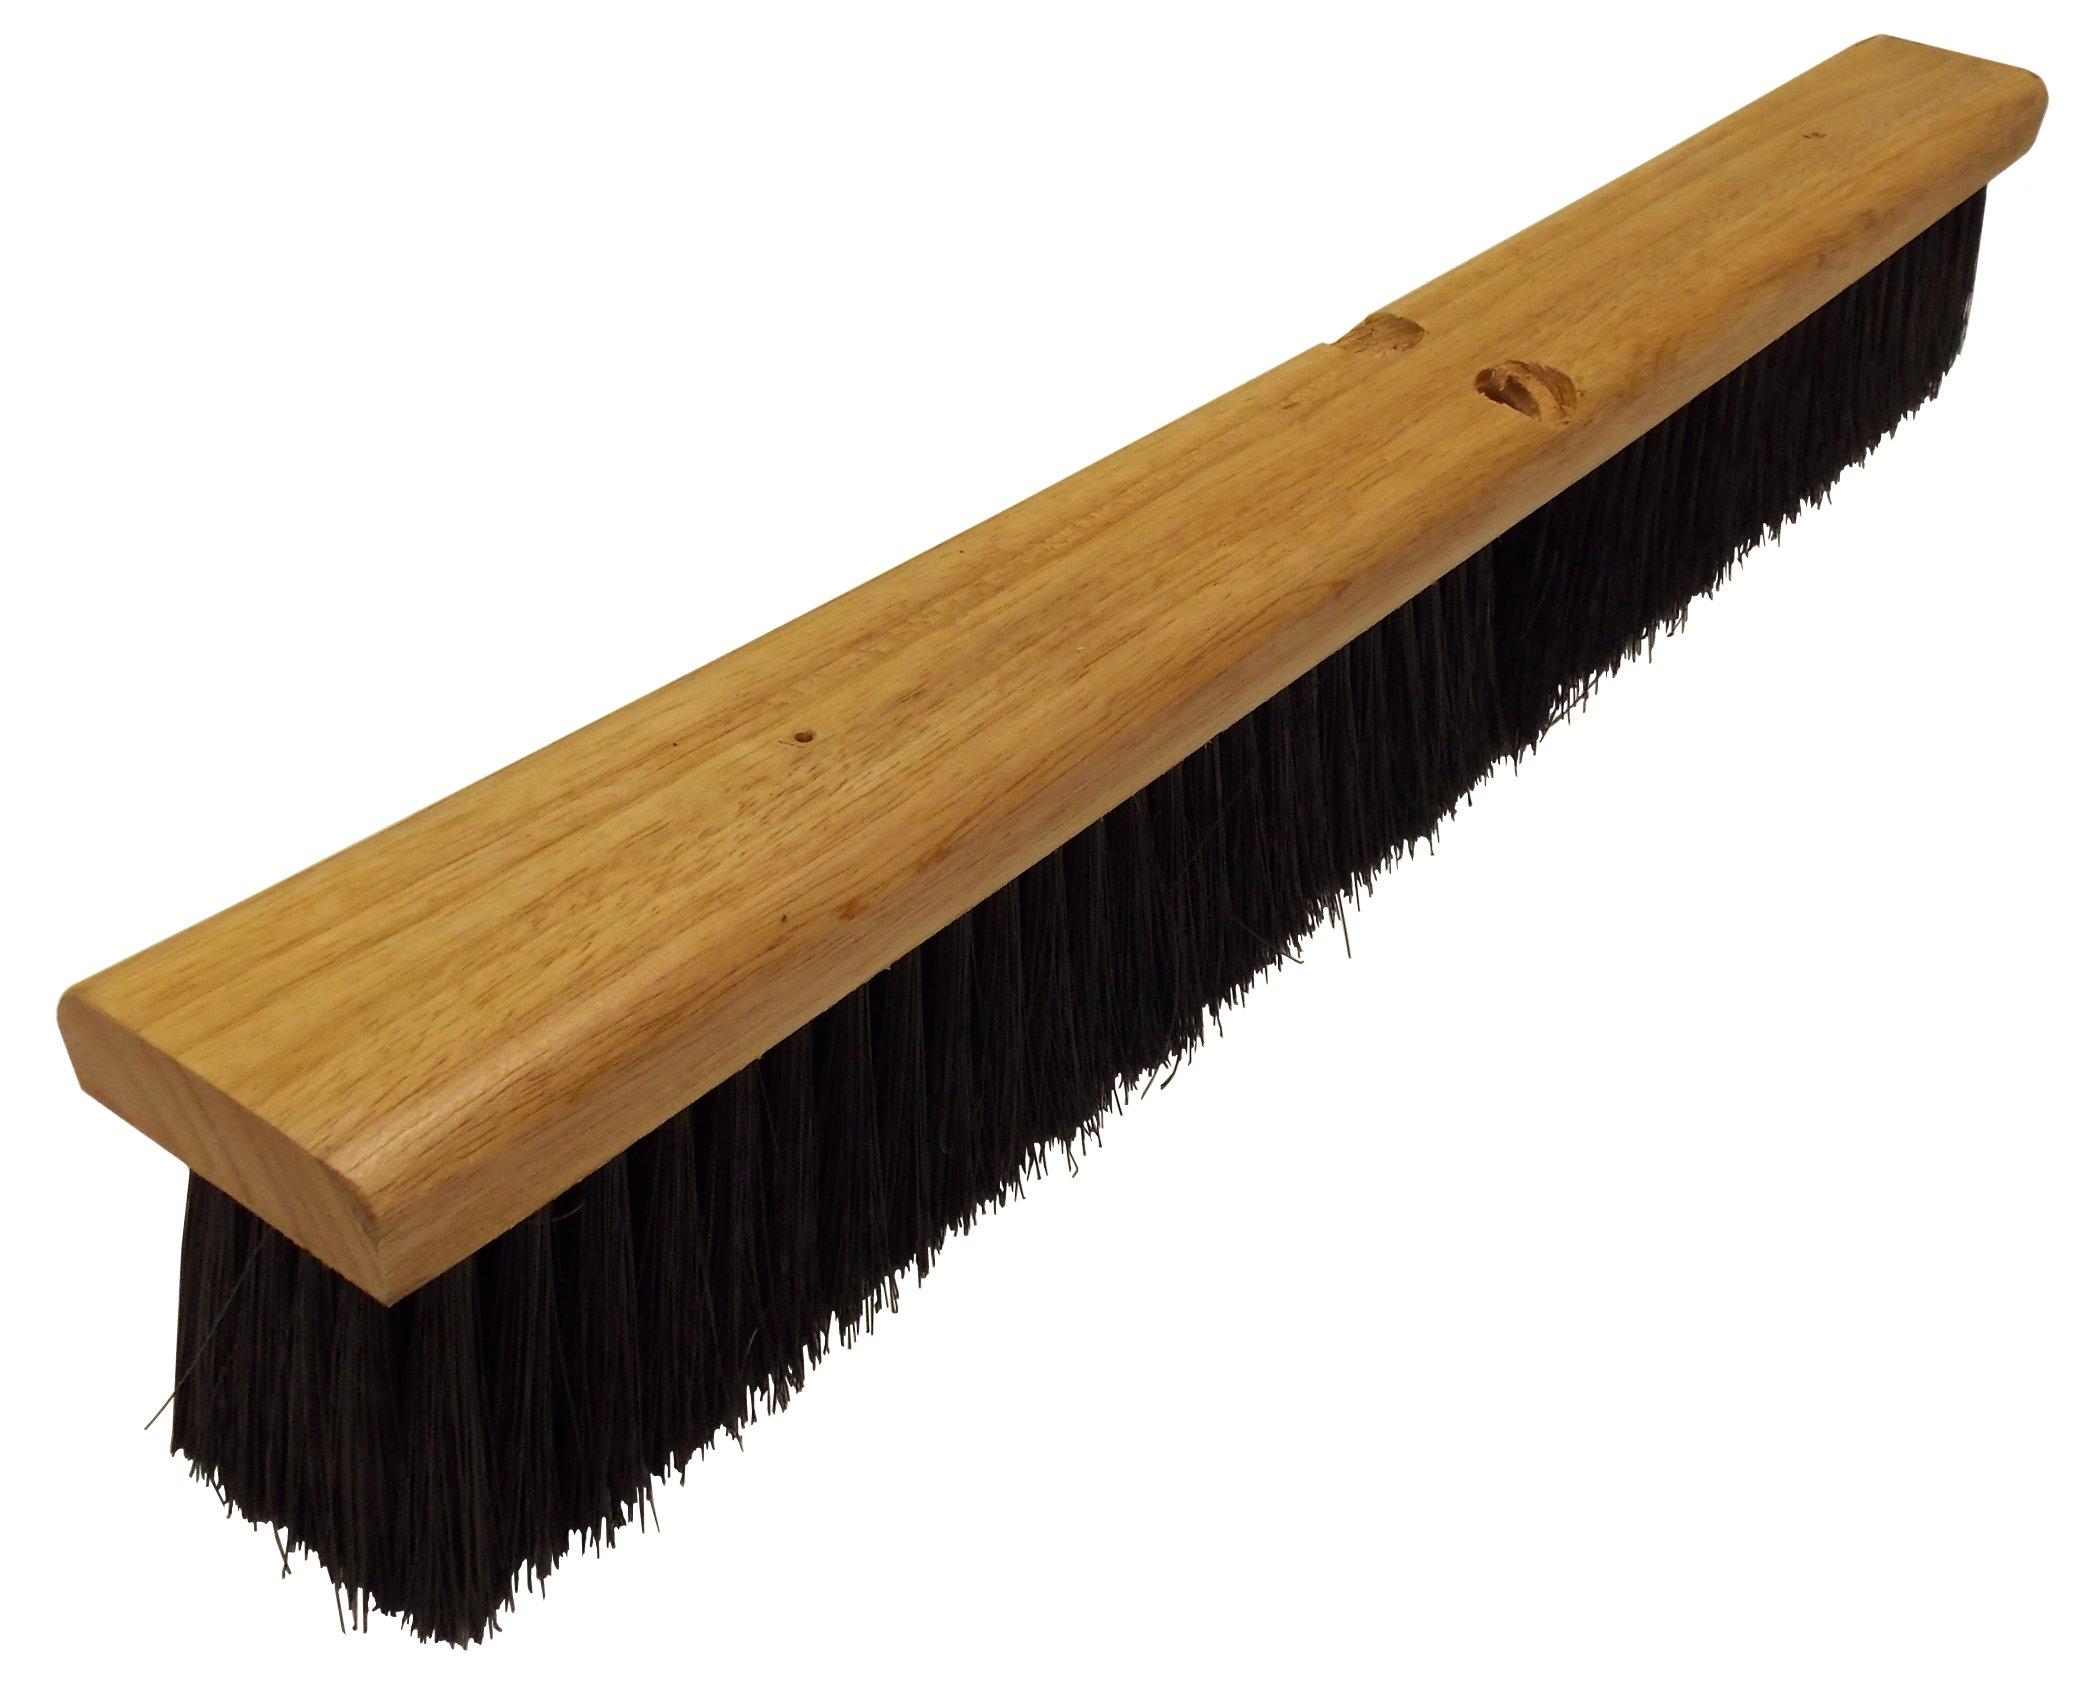 Wilen F007024, Polypropylene Floor Sweep, 24'' Wood Block, 3'' Bristle Trim, Black (Case of 12)